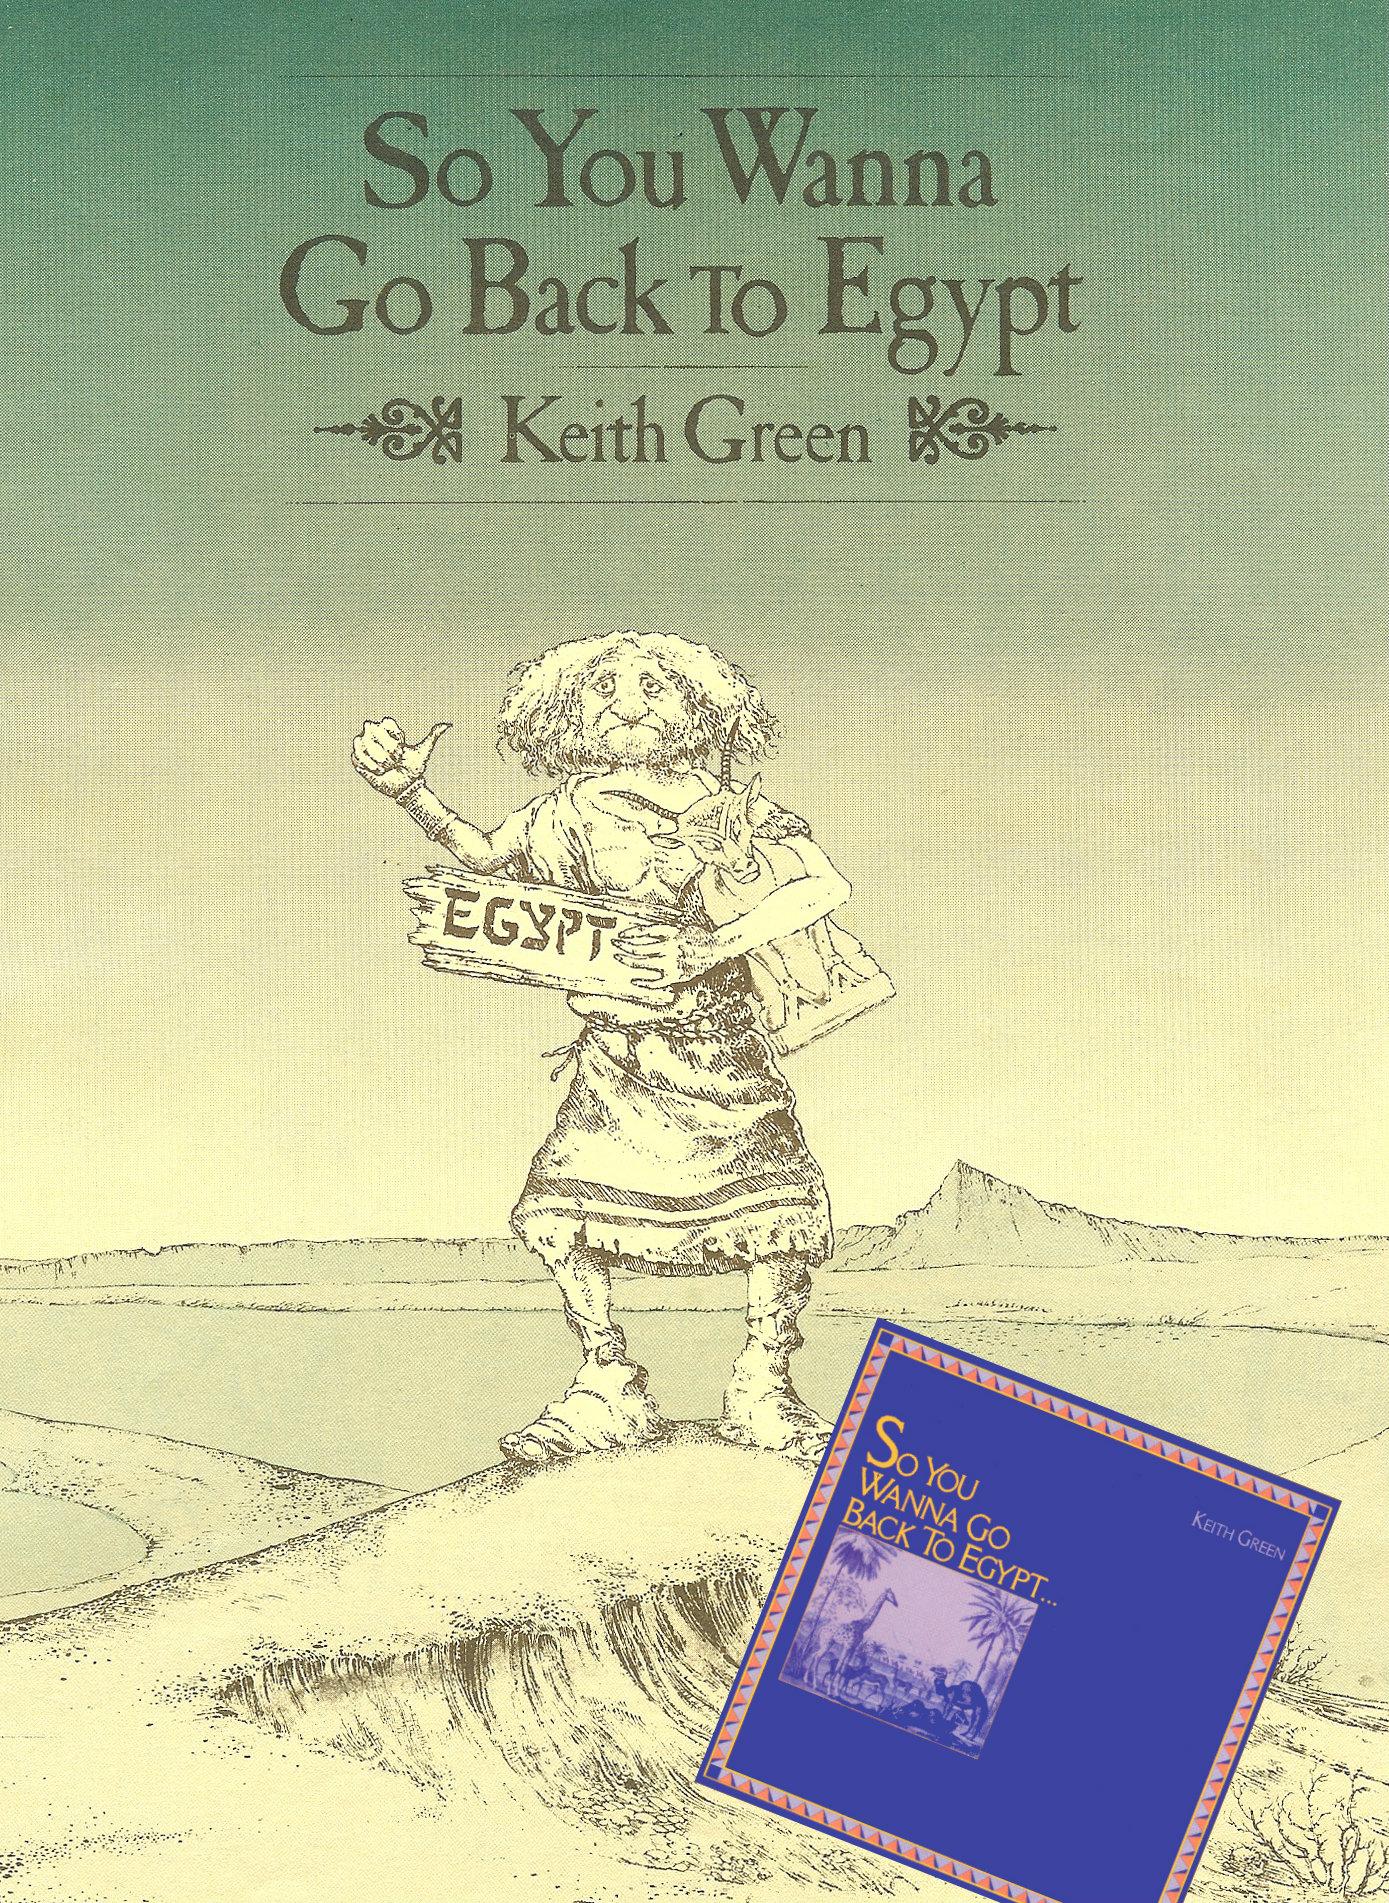 So You Wanna Go Back To Egypt Songtext